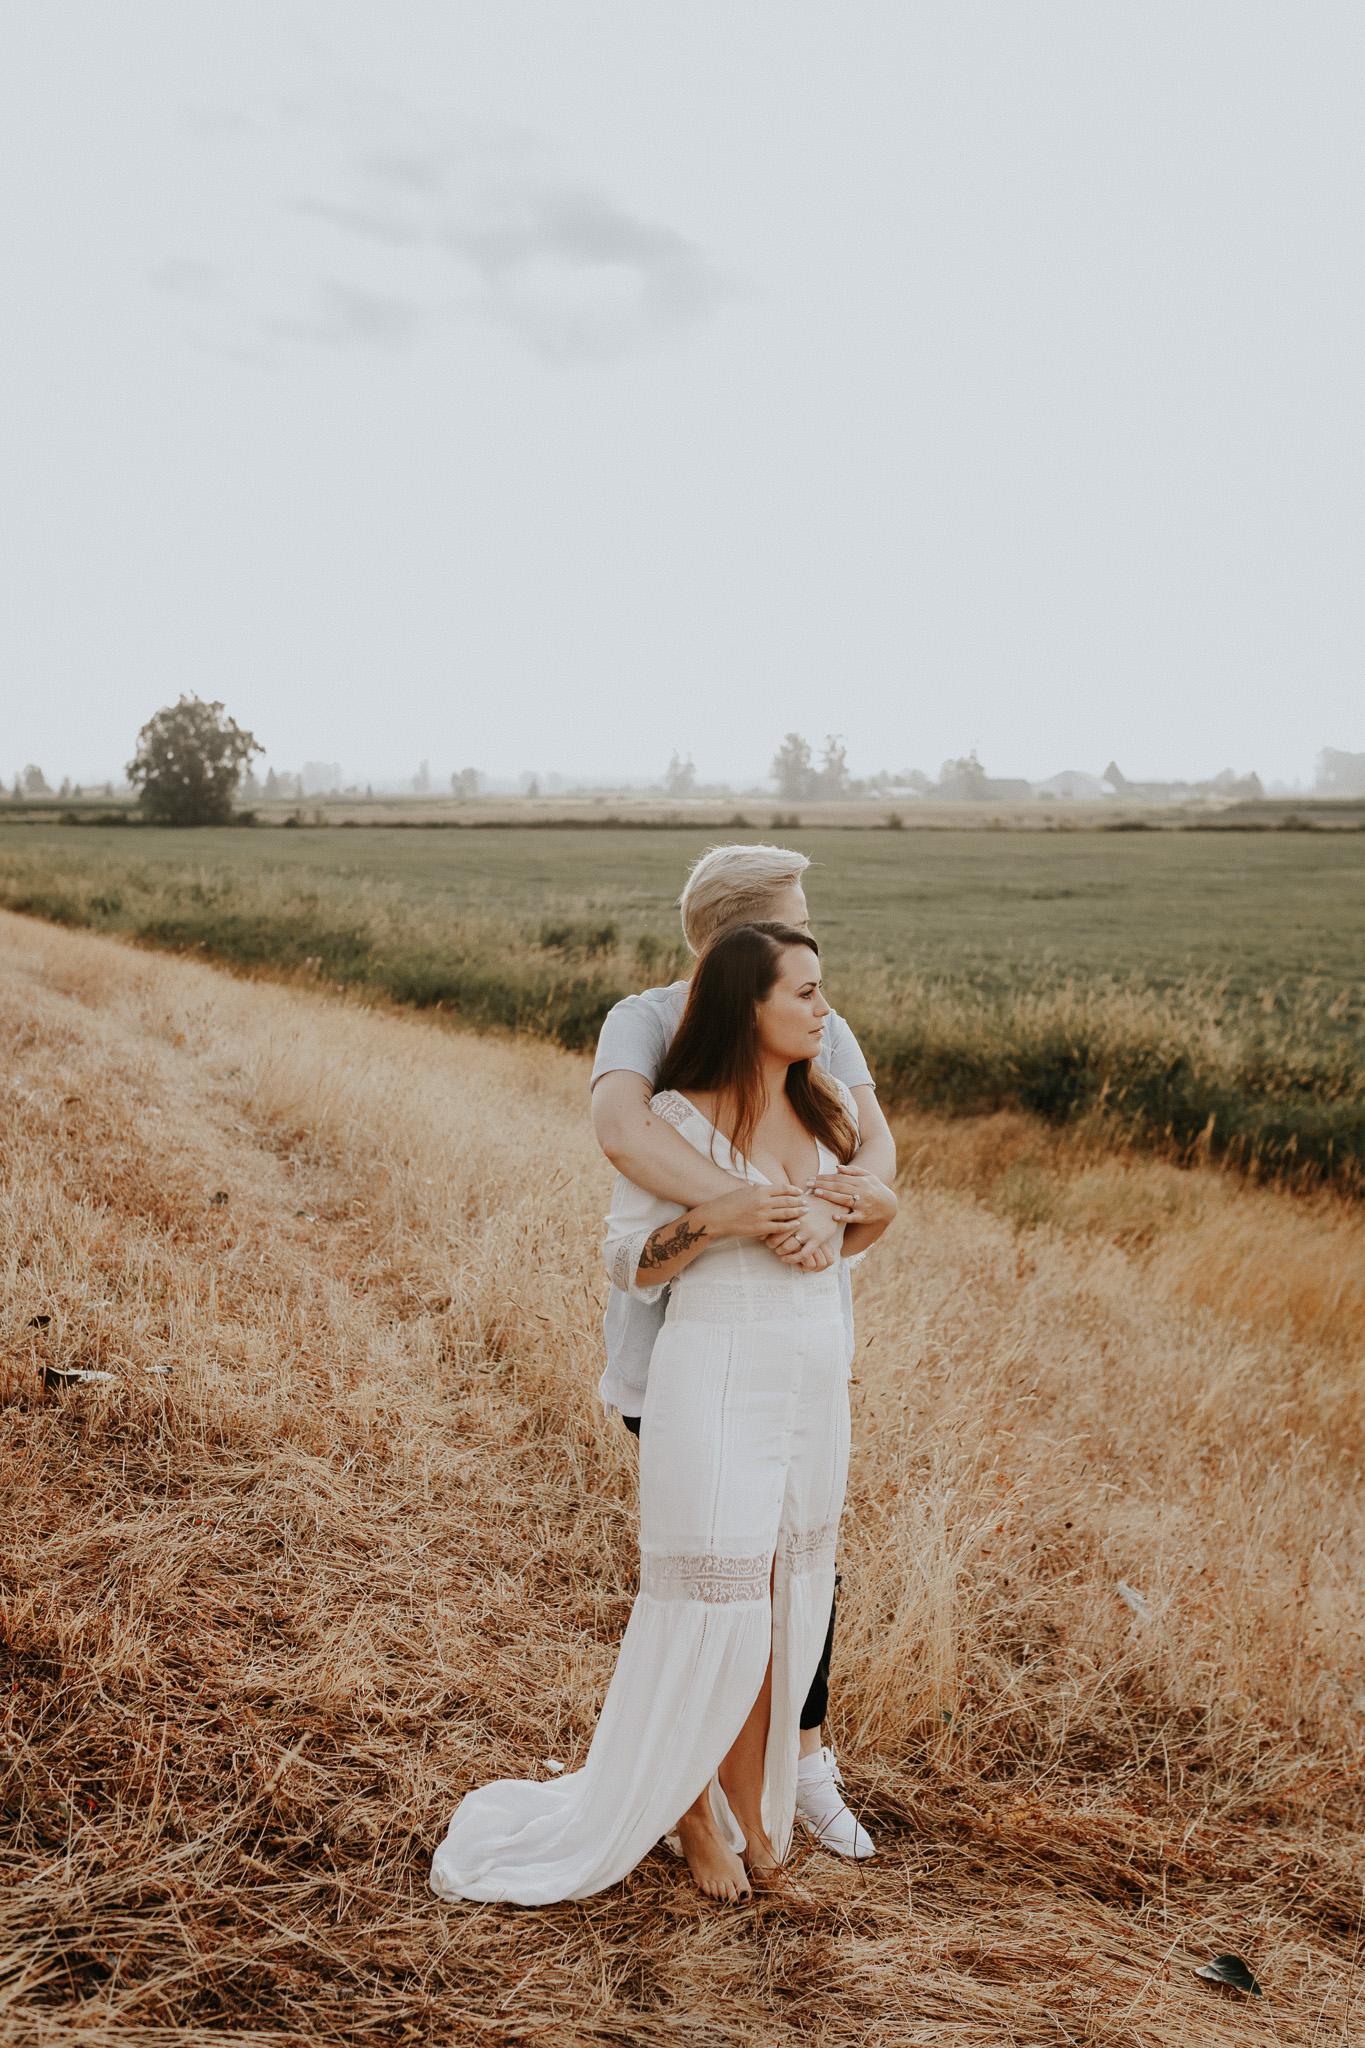 vancouver wedding photographer - lifestyle engagement session-14.jpg